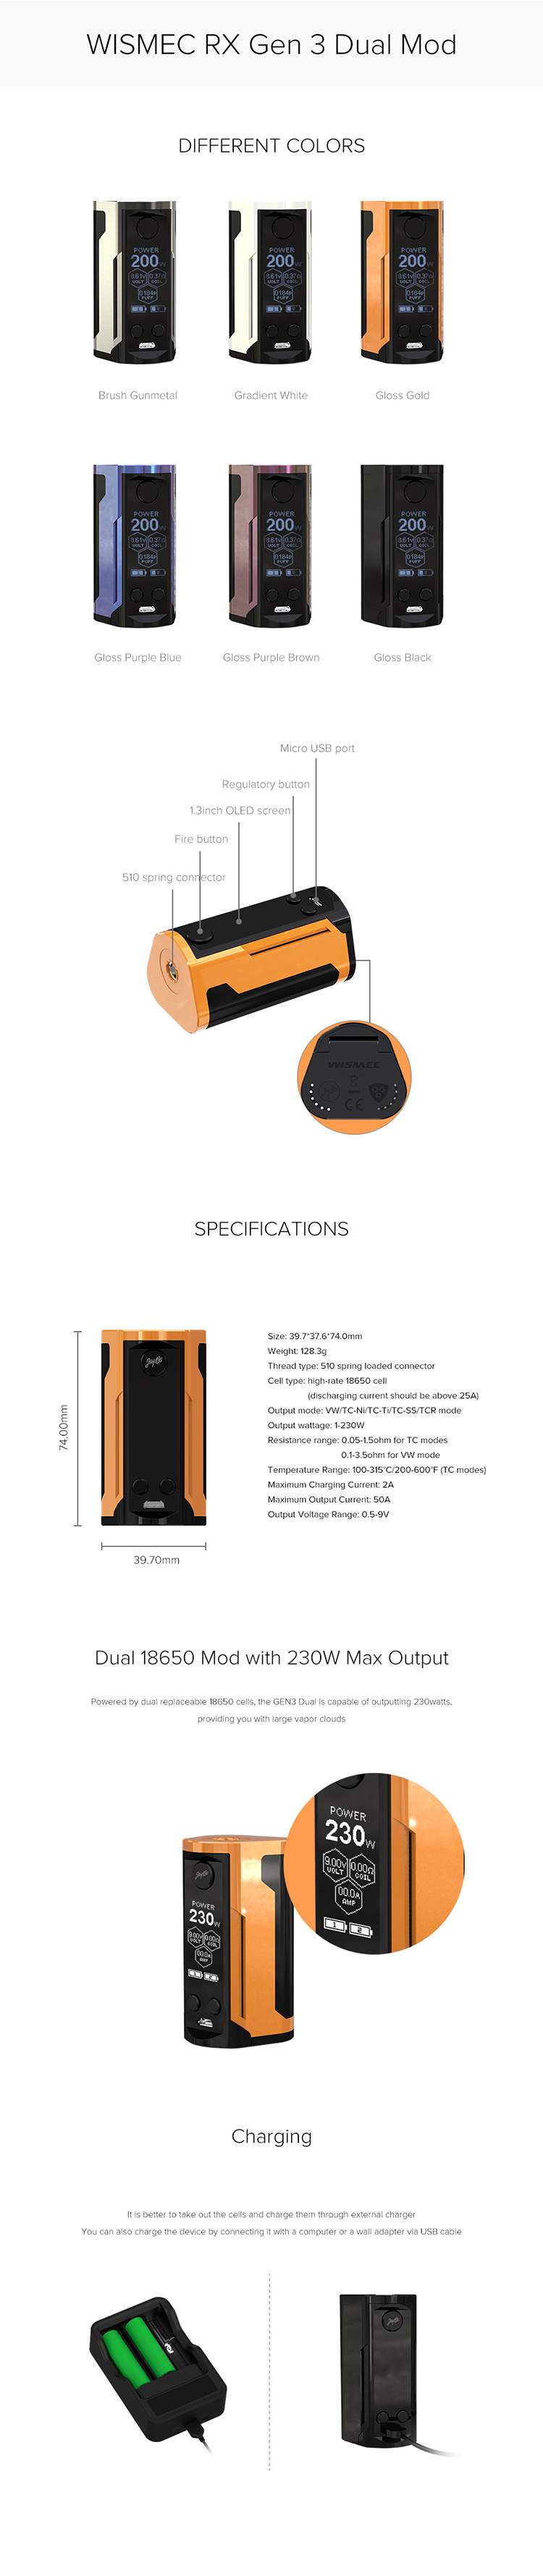 Wismec Reuleaux RX GEN3 Dual 230W Box Mod